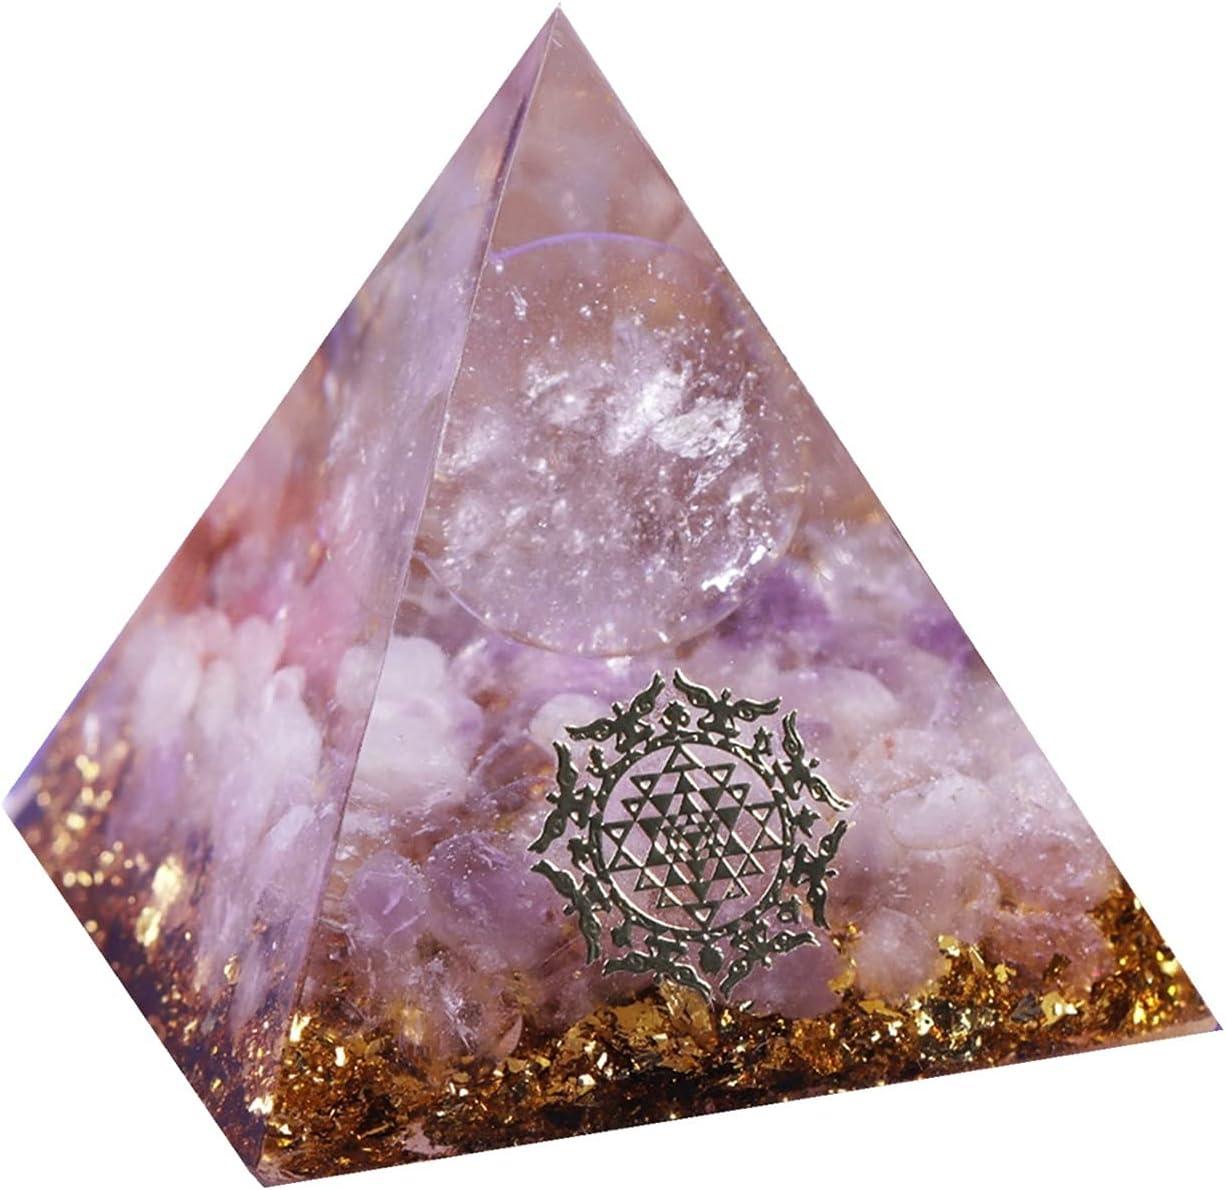 Max 87% OFF LUFEIAMZ Safety and trust Orgonite Pyramid Healing Sphere E Quartz Orgone